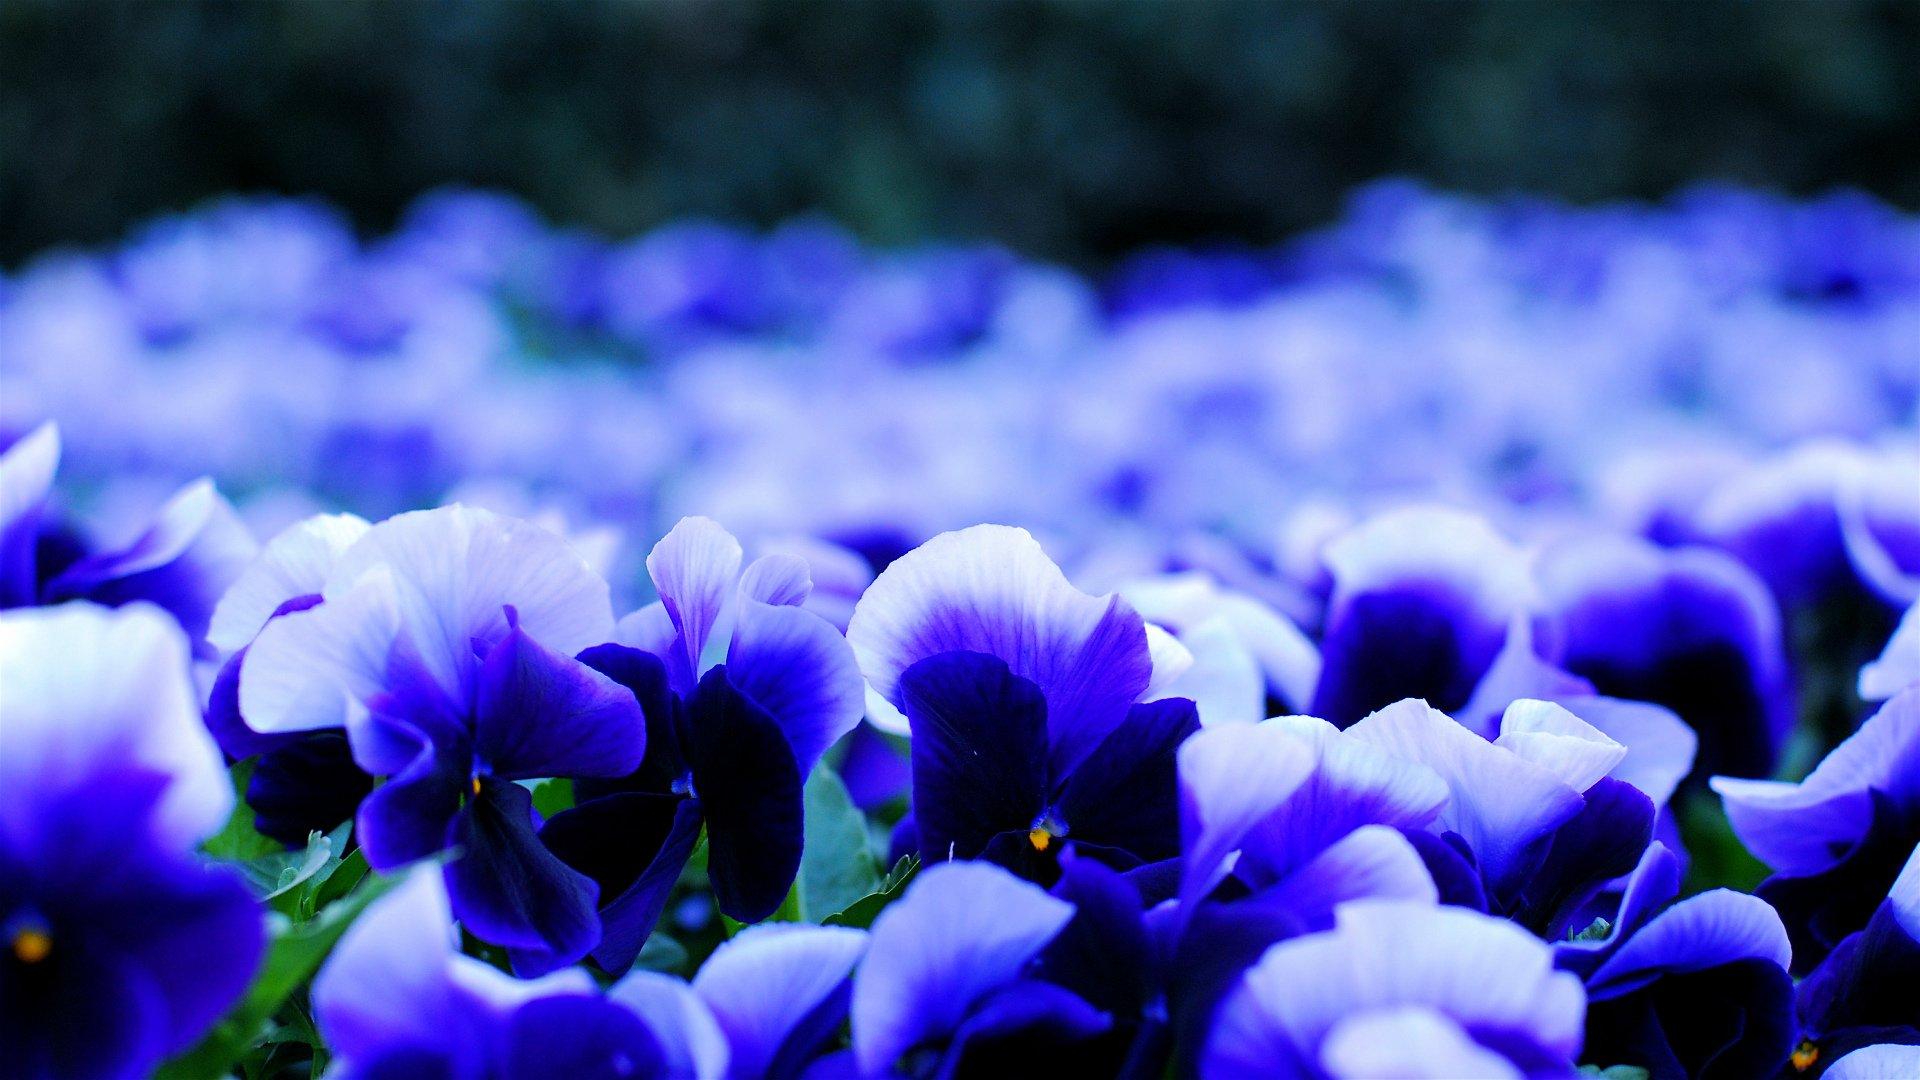 Flowers Flowers Purple Pansies Nature Jasmine Flower Wallpaper